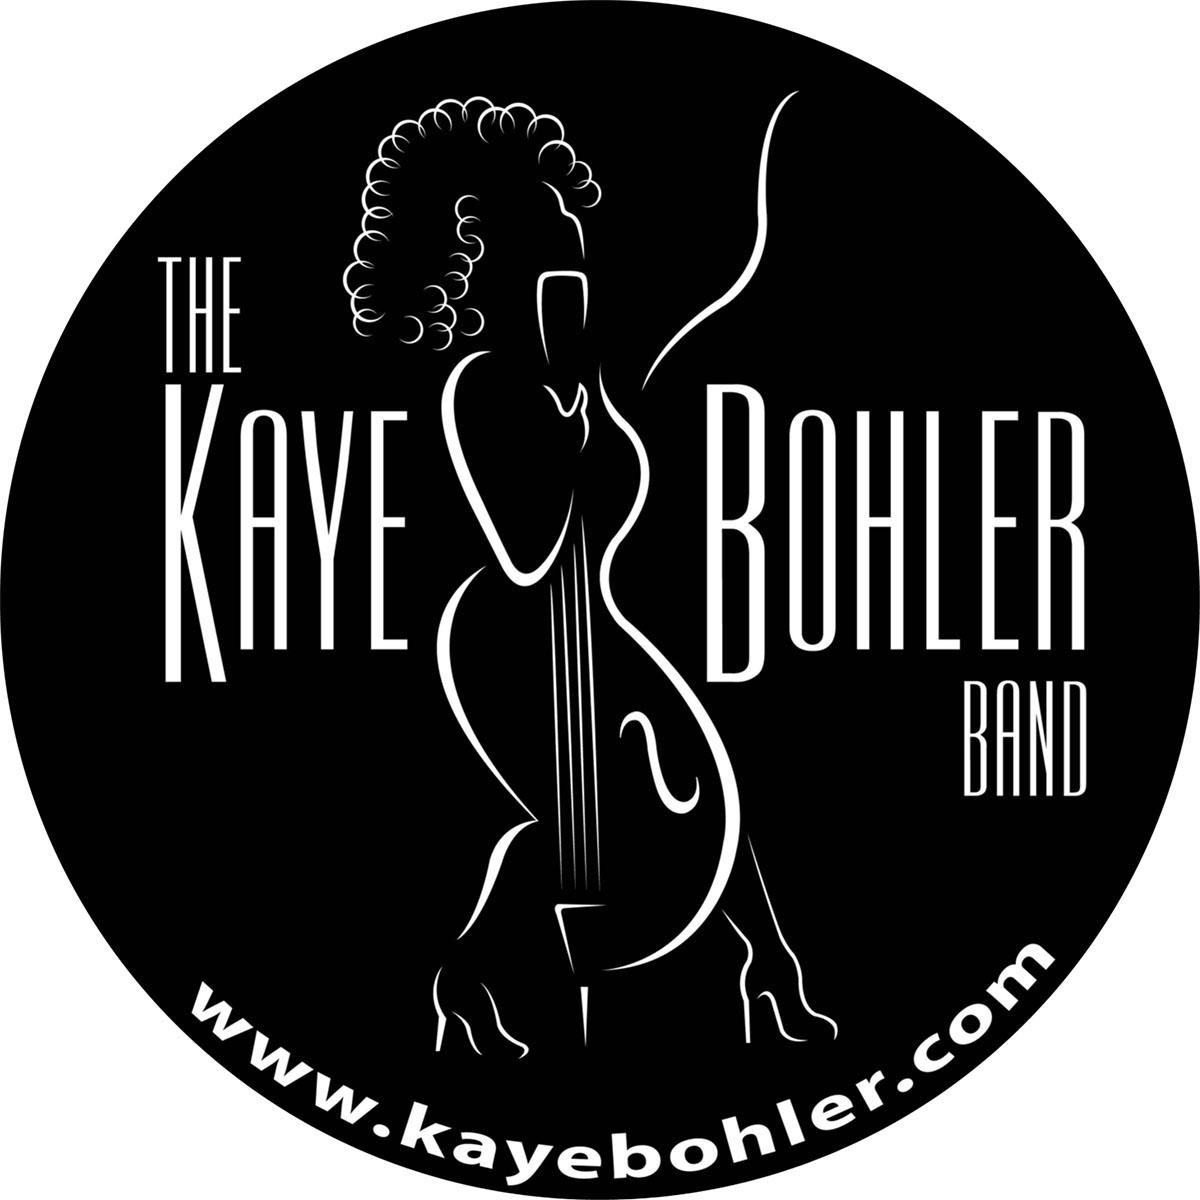 Kaye Bohler Band Logo